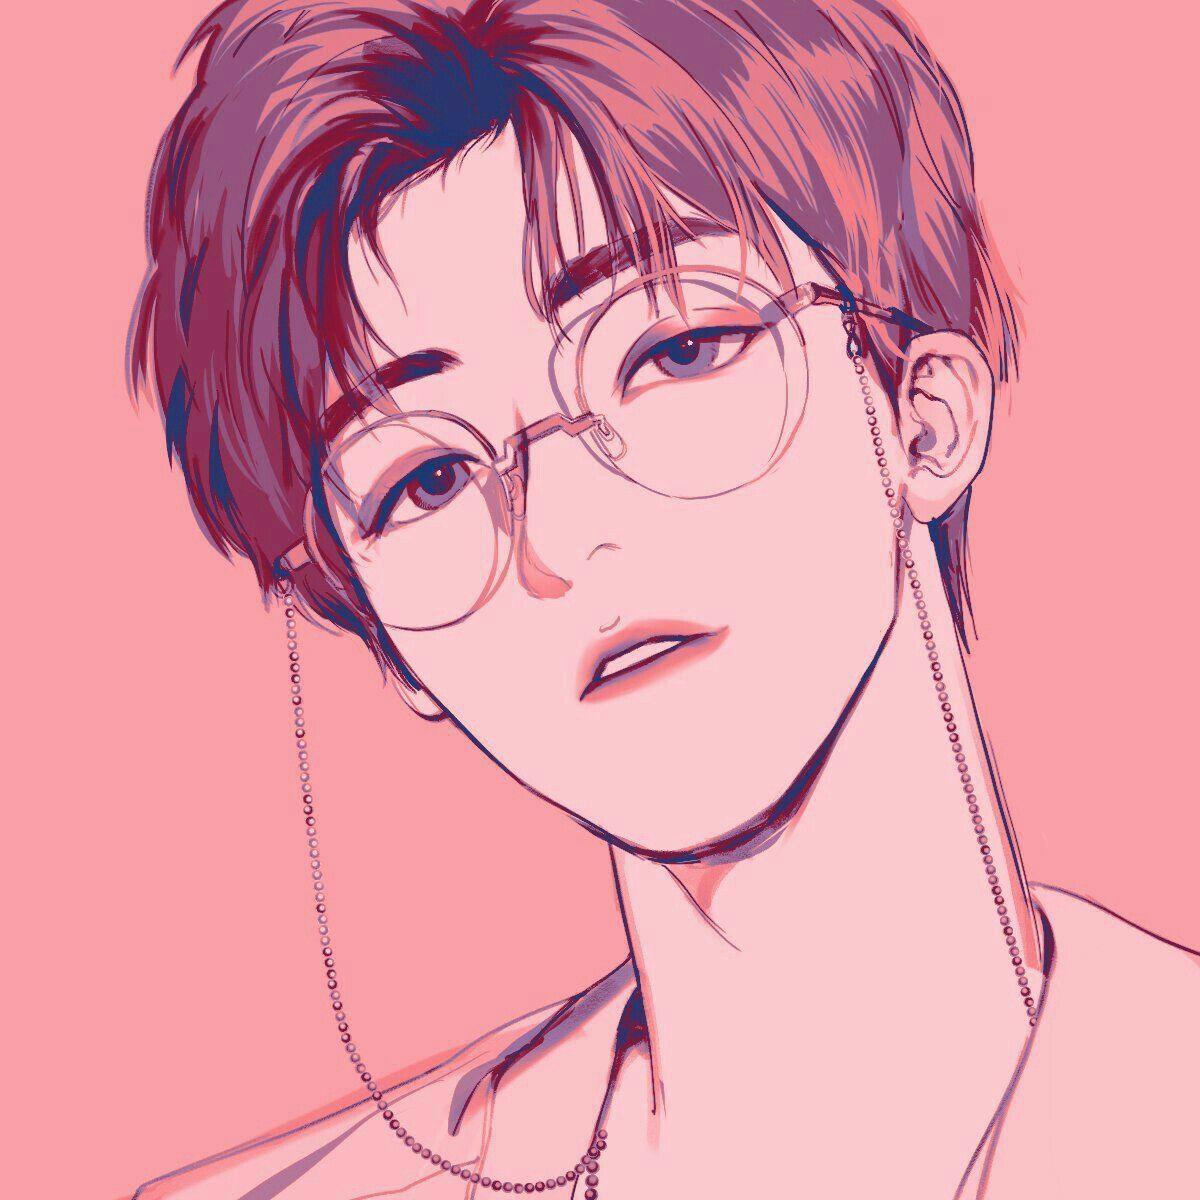 boy glasses pink digital art graphic design aesthetic